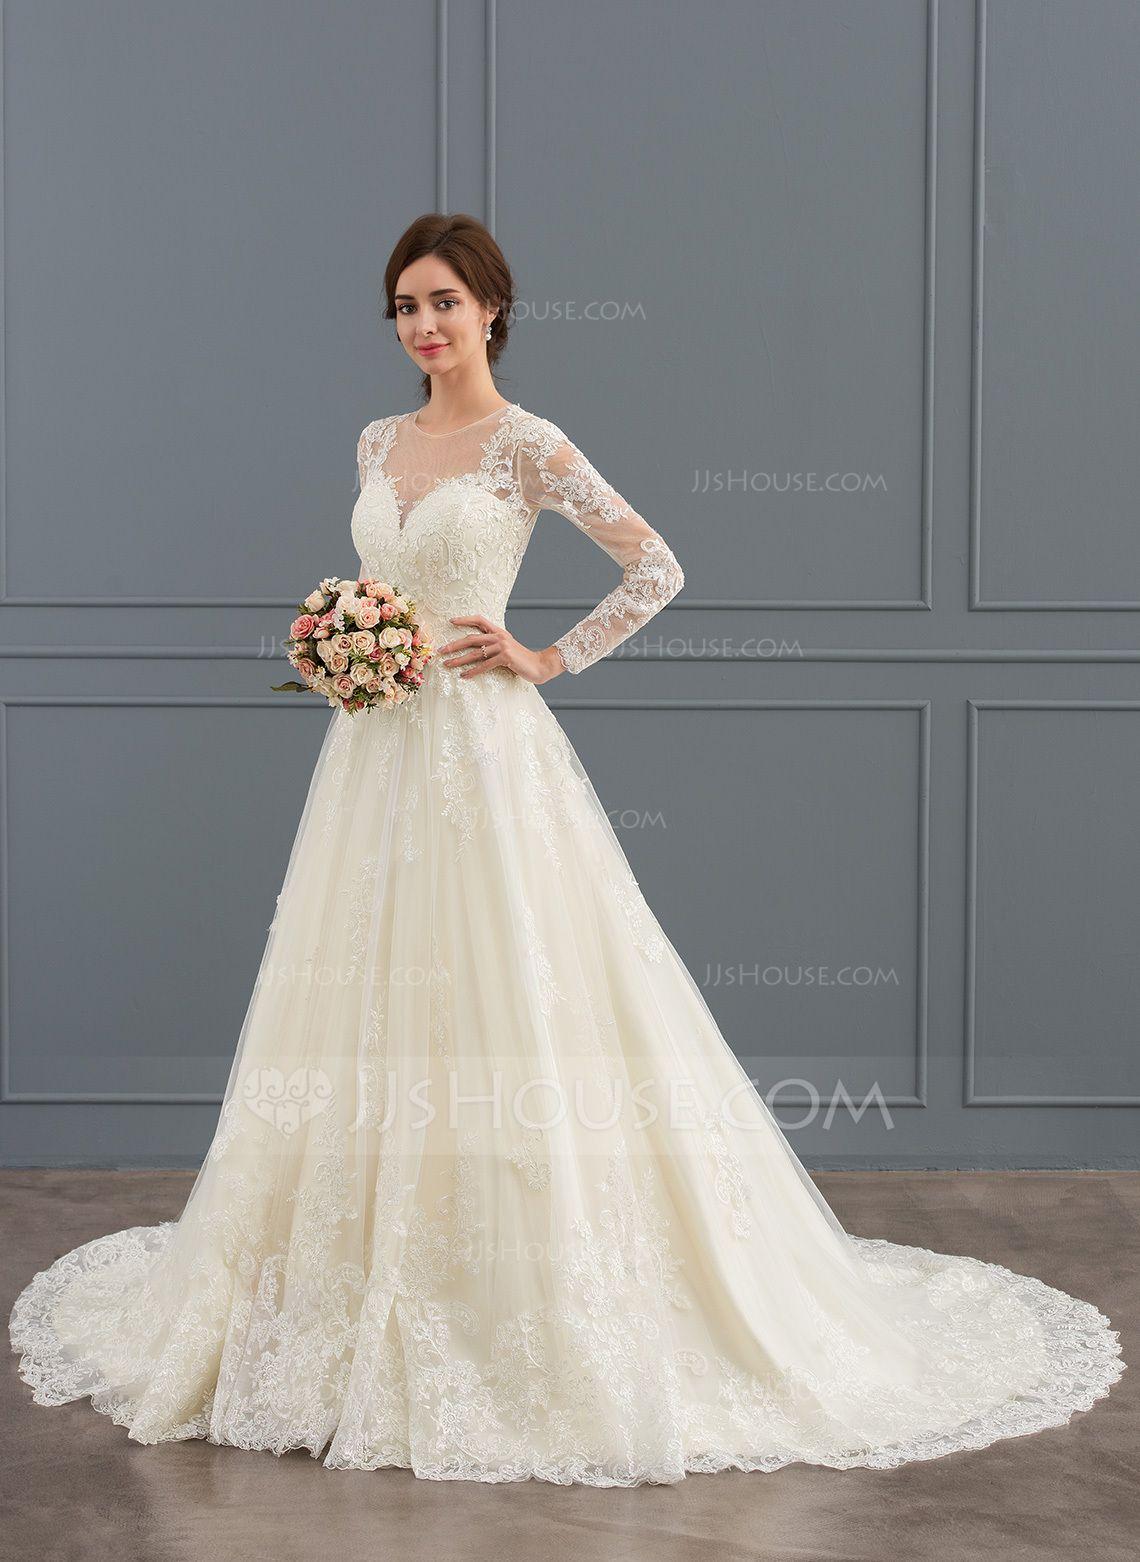 Us 276 00 Ball Gown Princess Illusion Court Train Tulle Lace Wedding Dress Jj S House Wedding Dress Long Sleeve Wedding Dresses Wedding Dresses Lace [ 1562 x 1140 Pixel ]